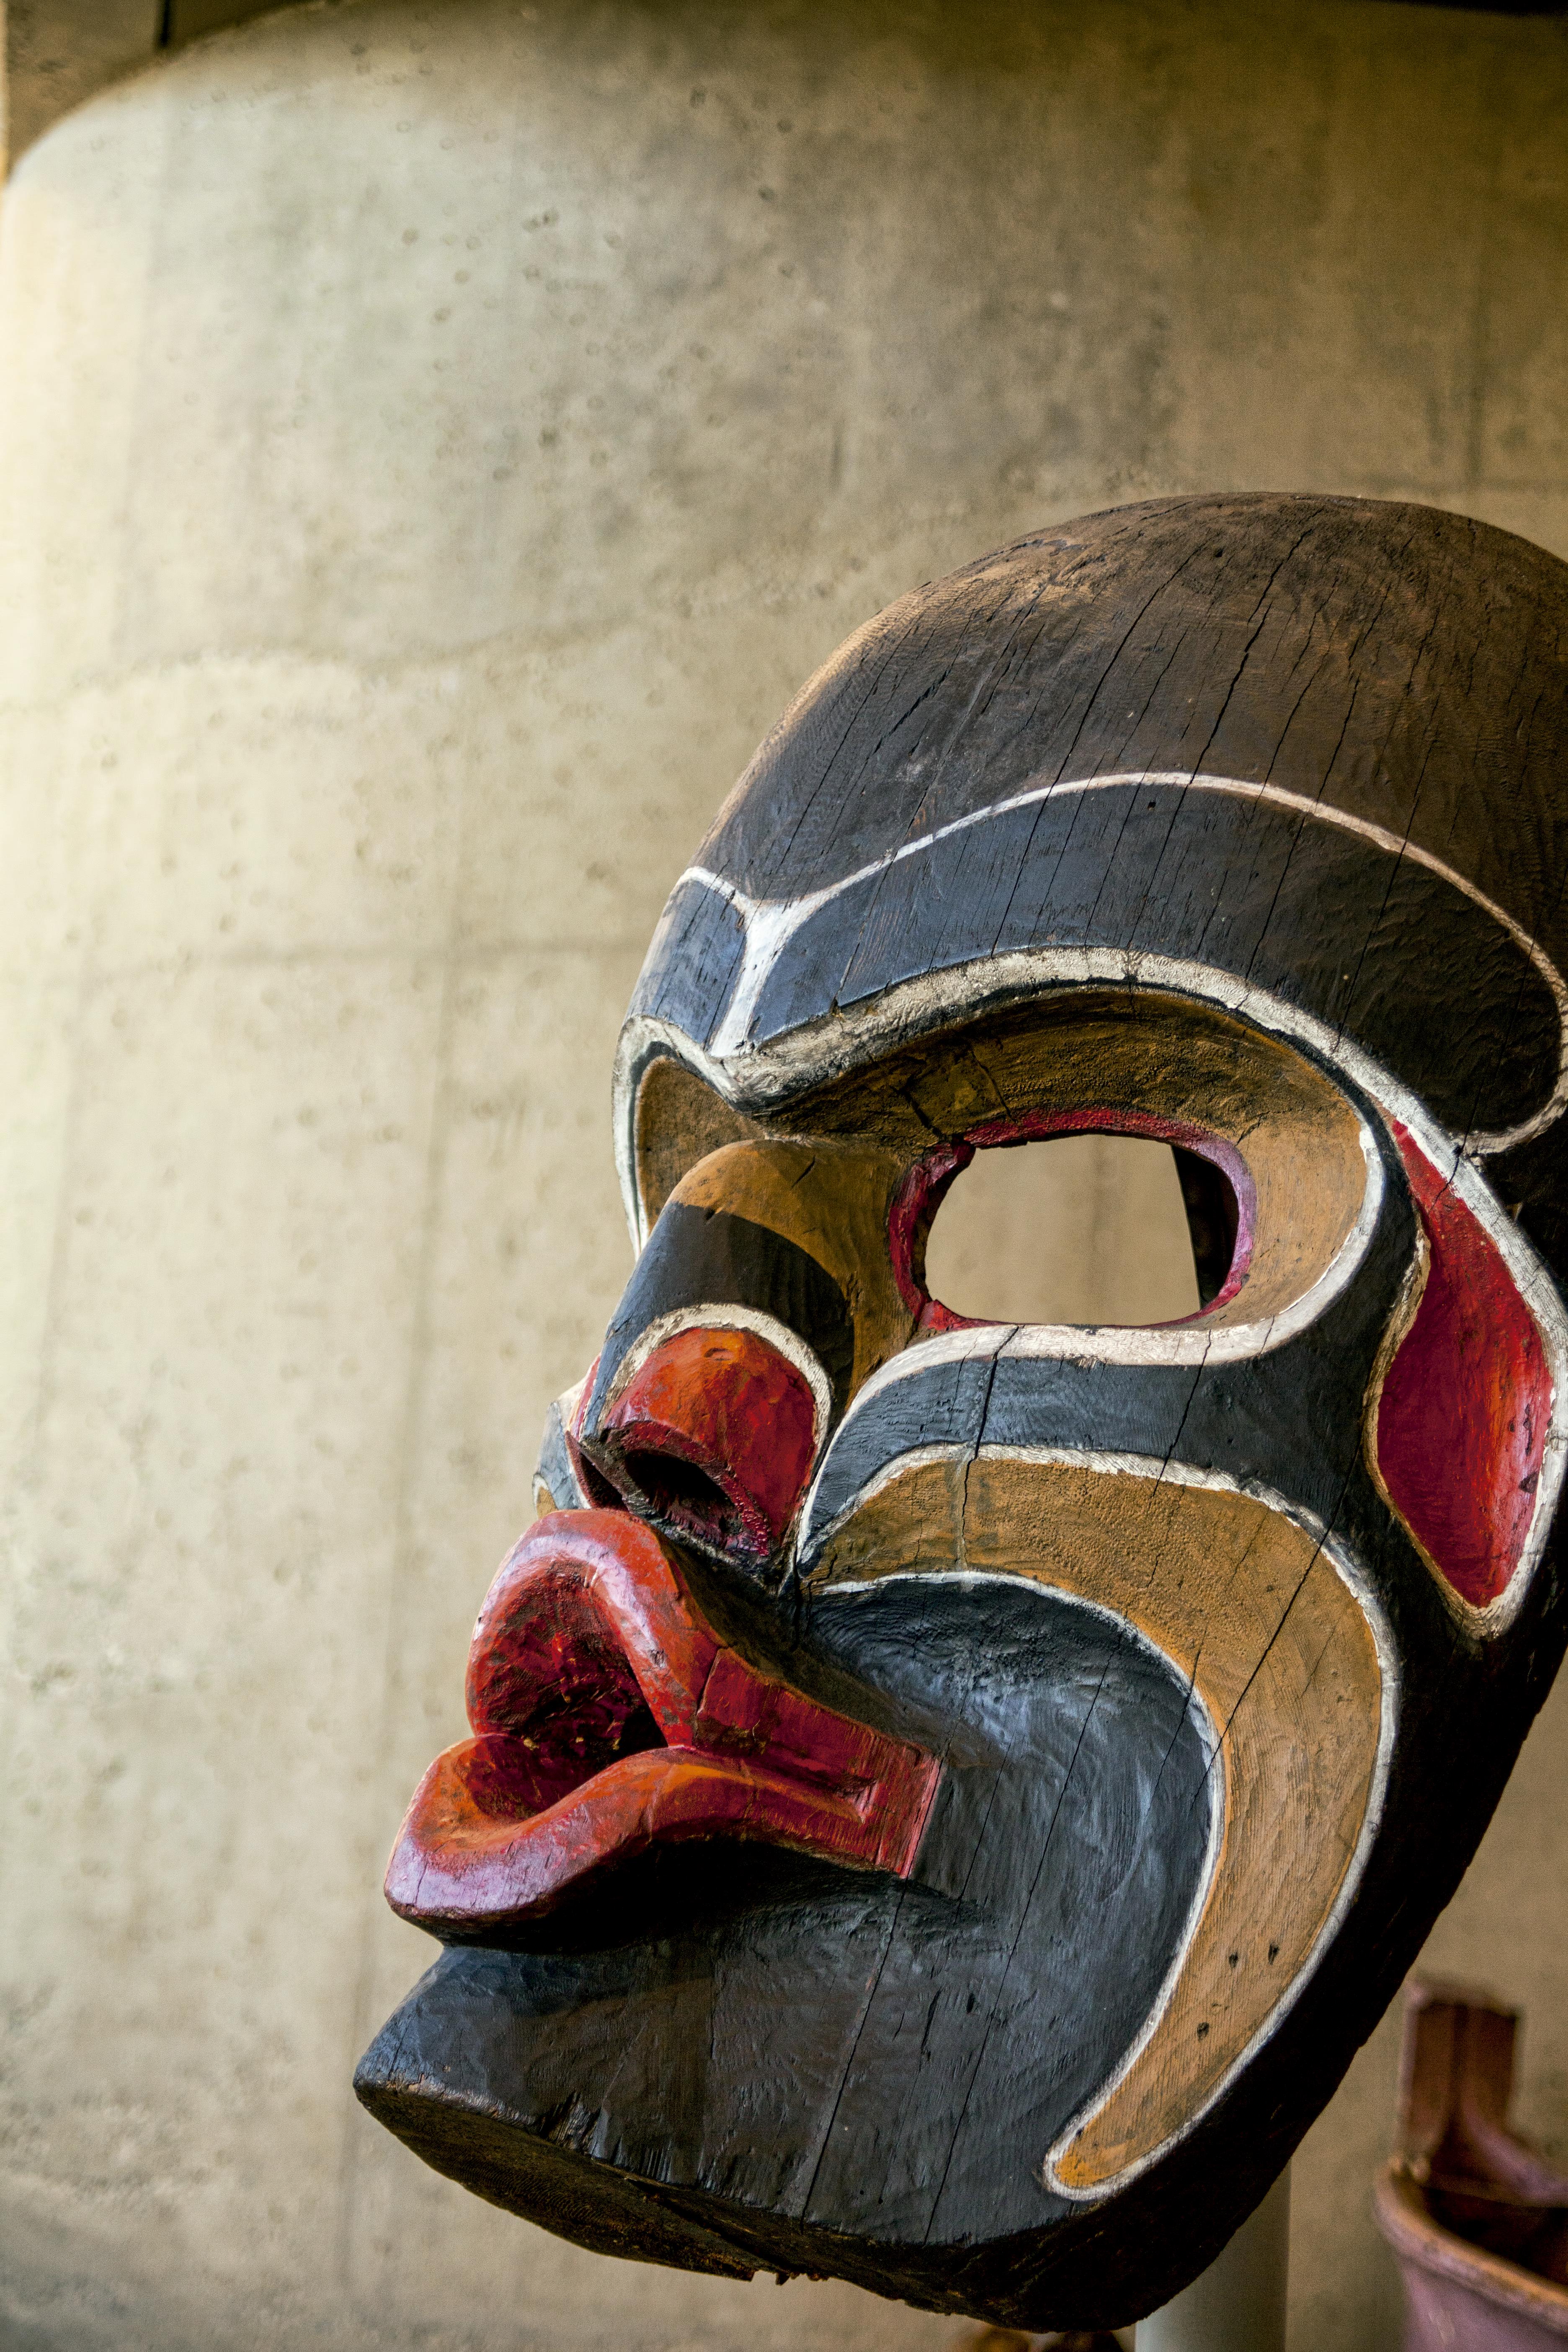 Máscara do Museu de Antropologia em Vancouver, Canadá